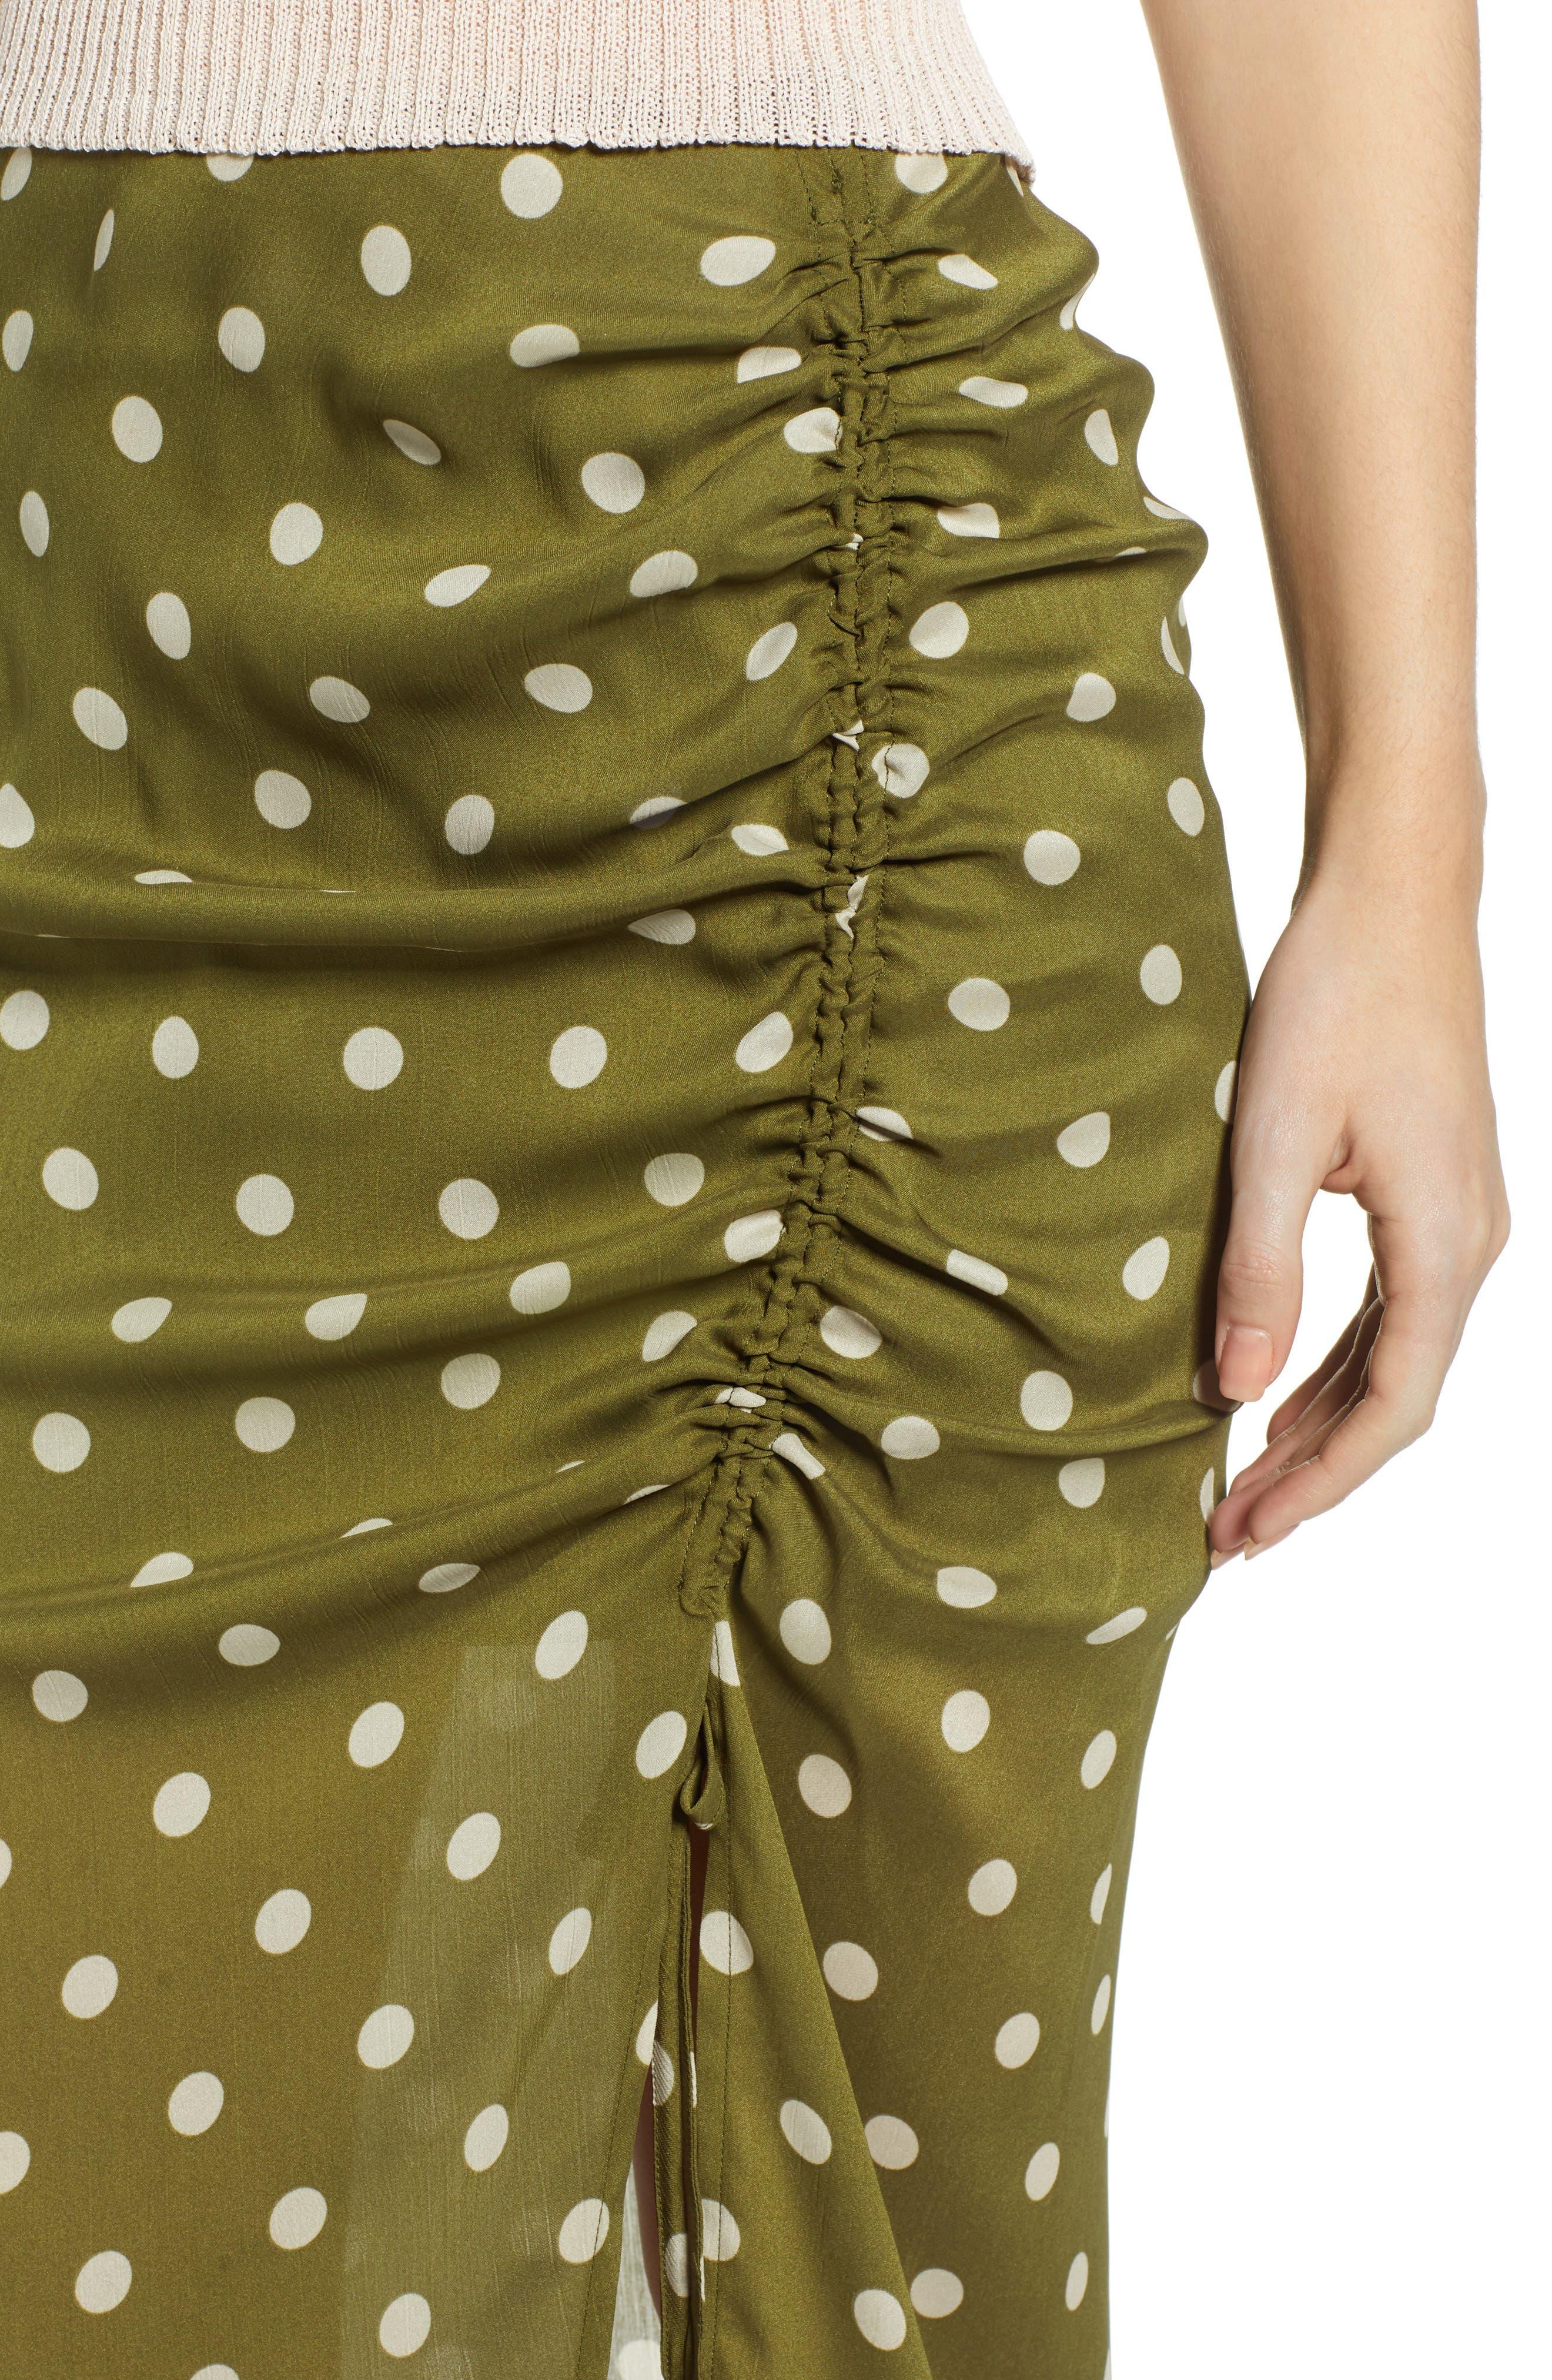 CHRISELLE LIM COLLECTION, Chriselle Lim Ren Ruched Skirt, Alternate thumbnail 4, color, CREAM/ OLIVE